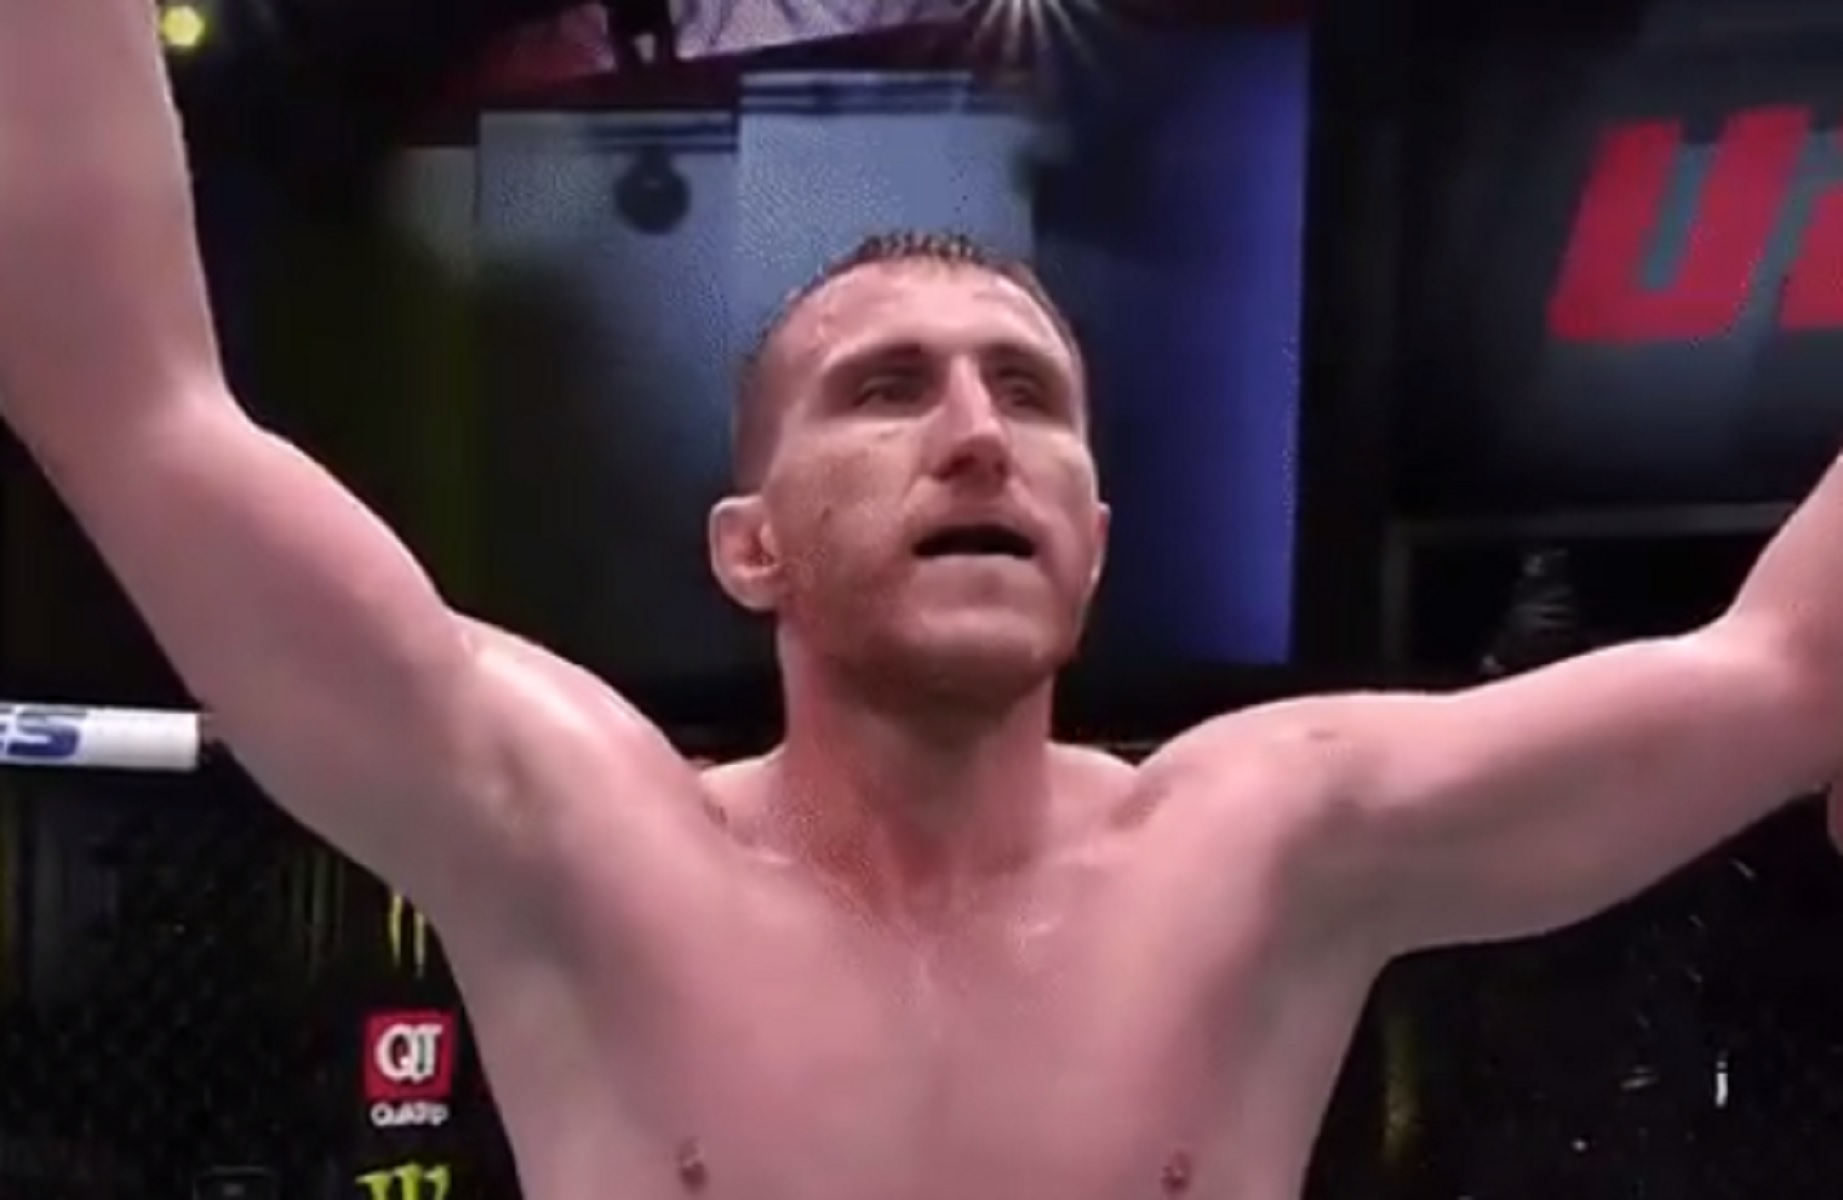 UFC: Ο Μιχαηλίδης έγινε ο πρώτος Έλληνας που πανηγύρισε νίκη στην κορυφαία διοργάνωση